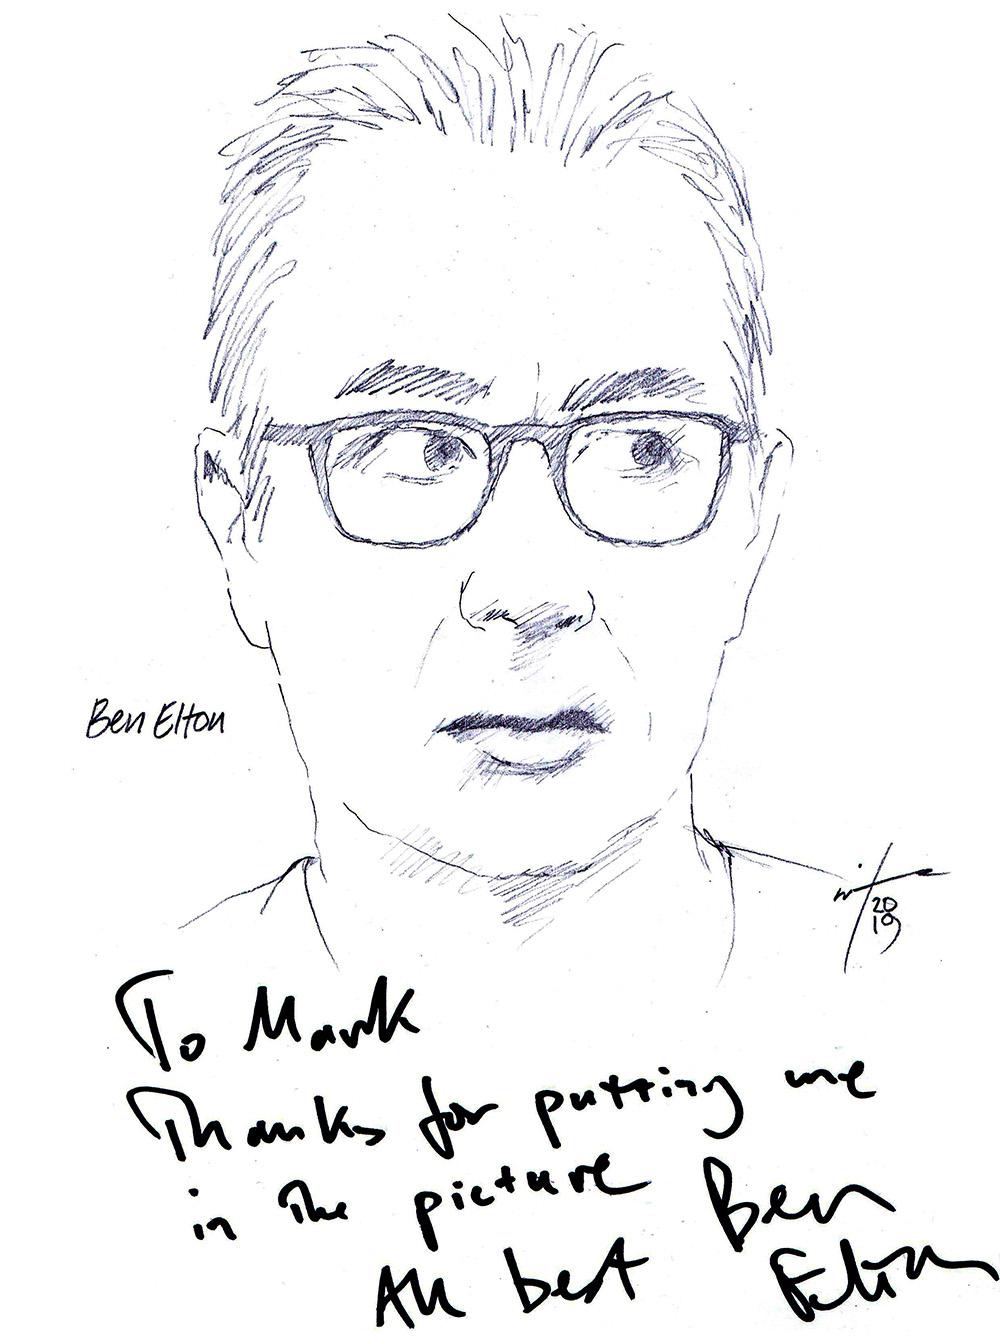 Autographed drawing of writer Ben Elton